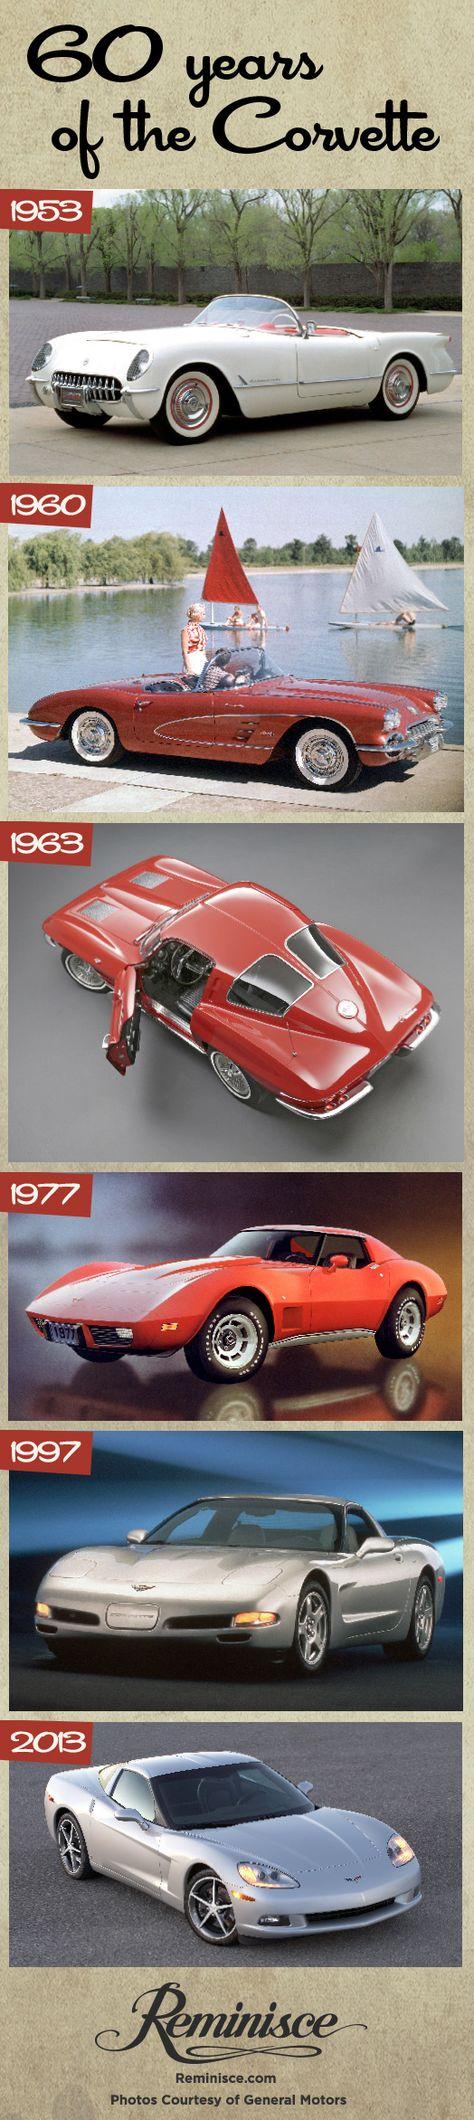 1969 cougar classic car restoration by doug jenkins garage - 1978 Corvette 25th Anniversary Pacecar Rear By Char1iej Via Flickr Corvette Pinterest Corvettes 25th Anniversary And Anniversaries